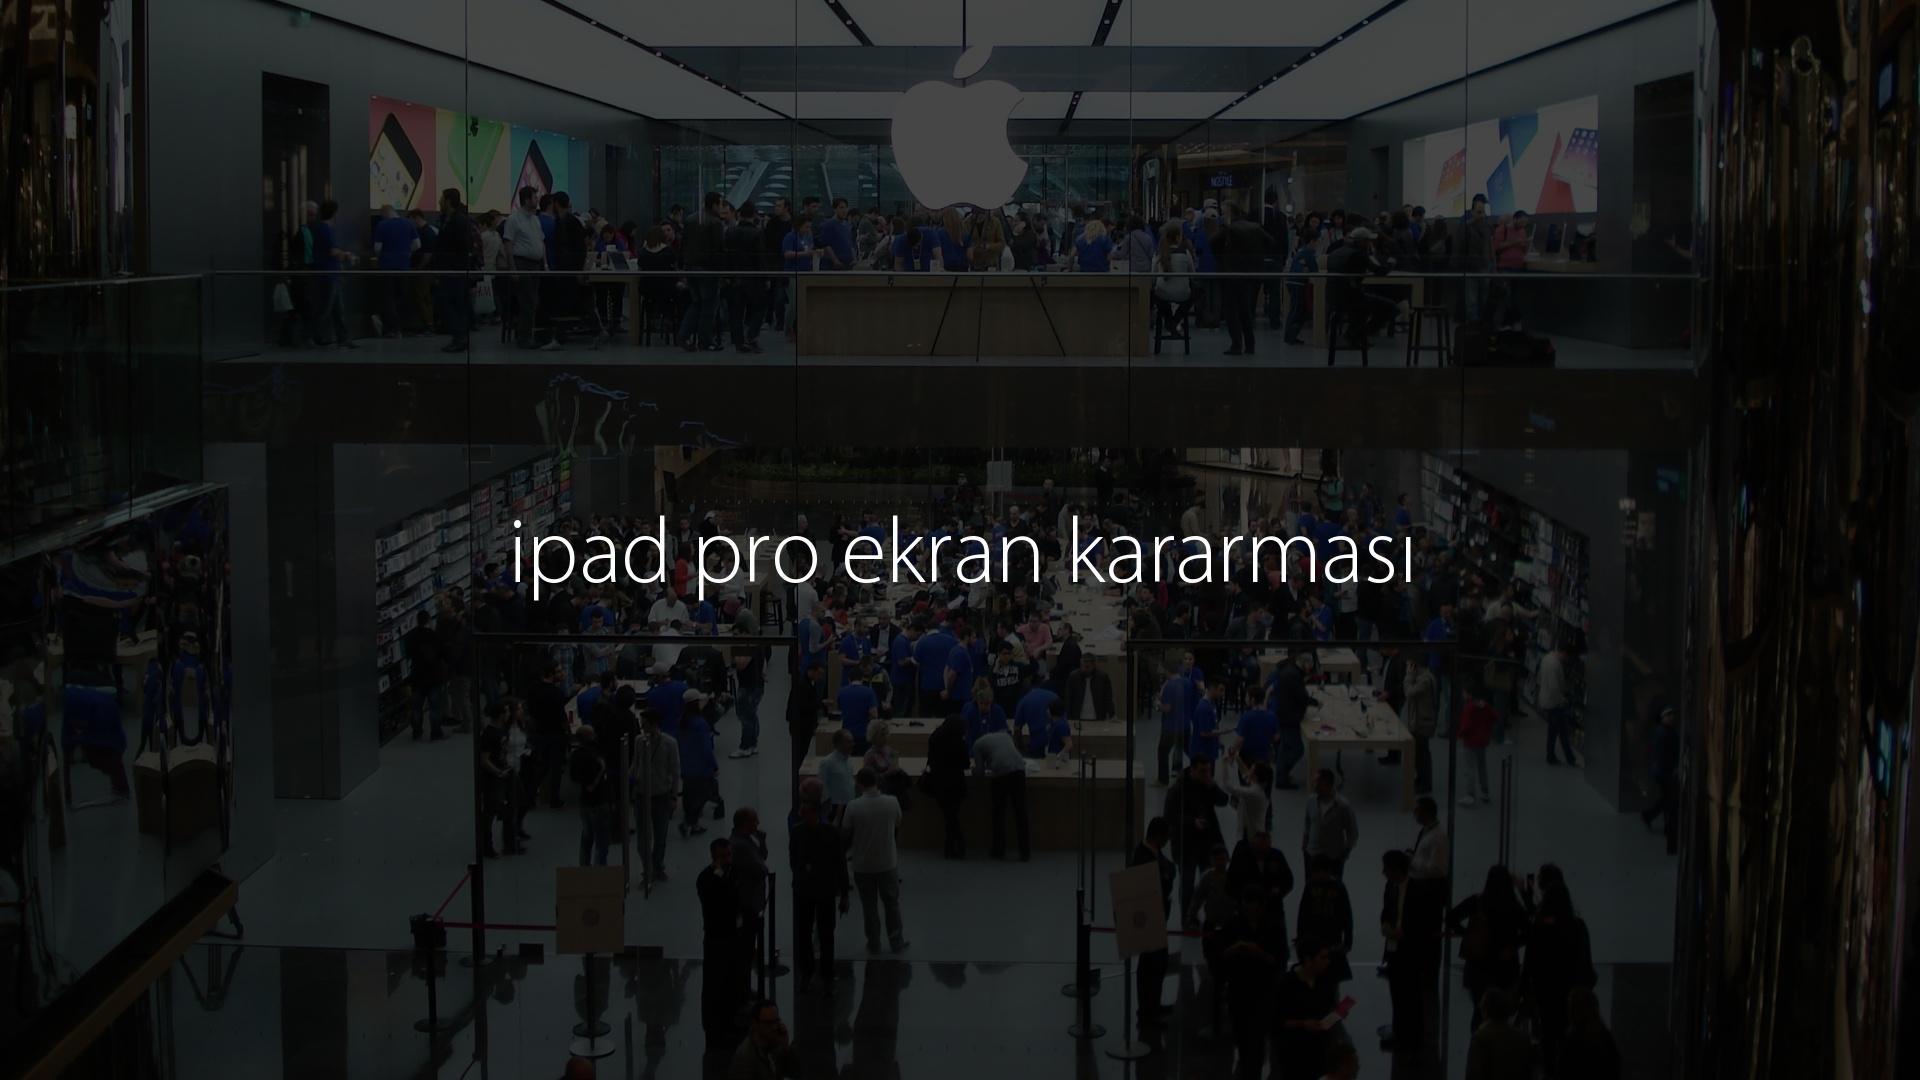 ipad pro ekran kararması